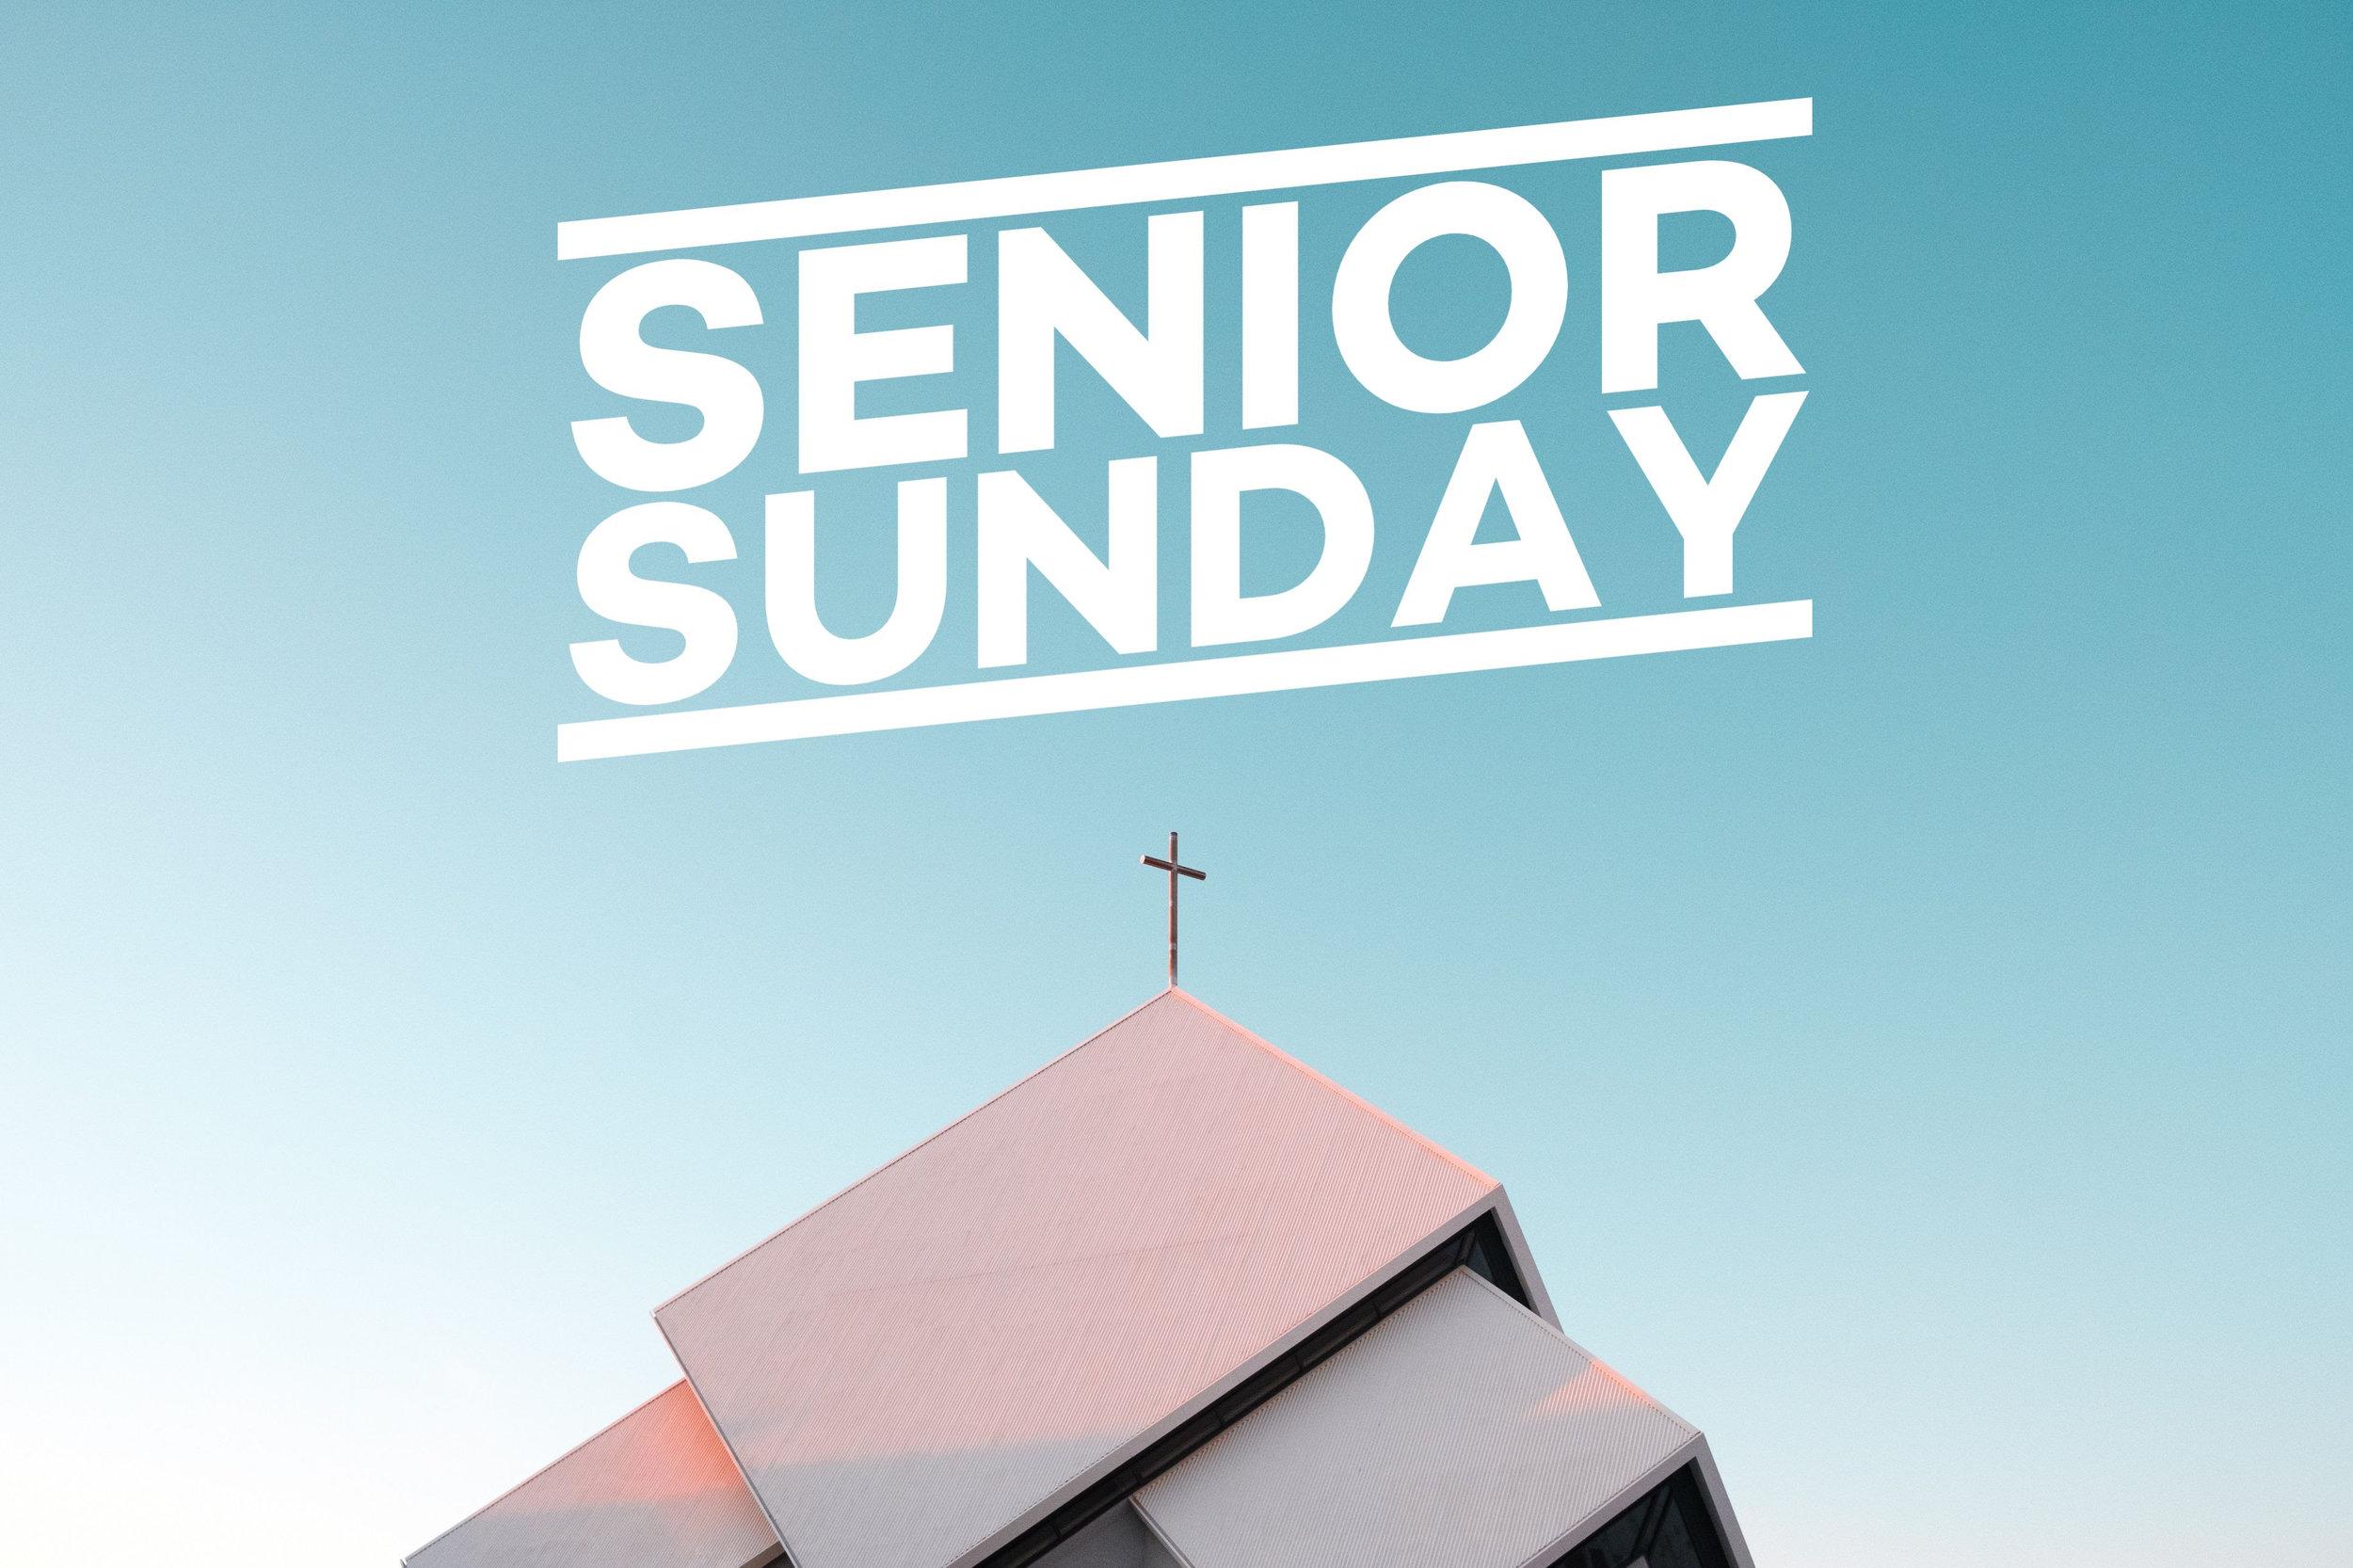 senior sunday.jpeg